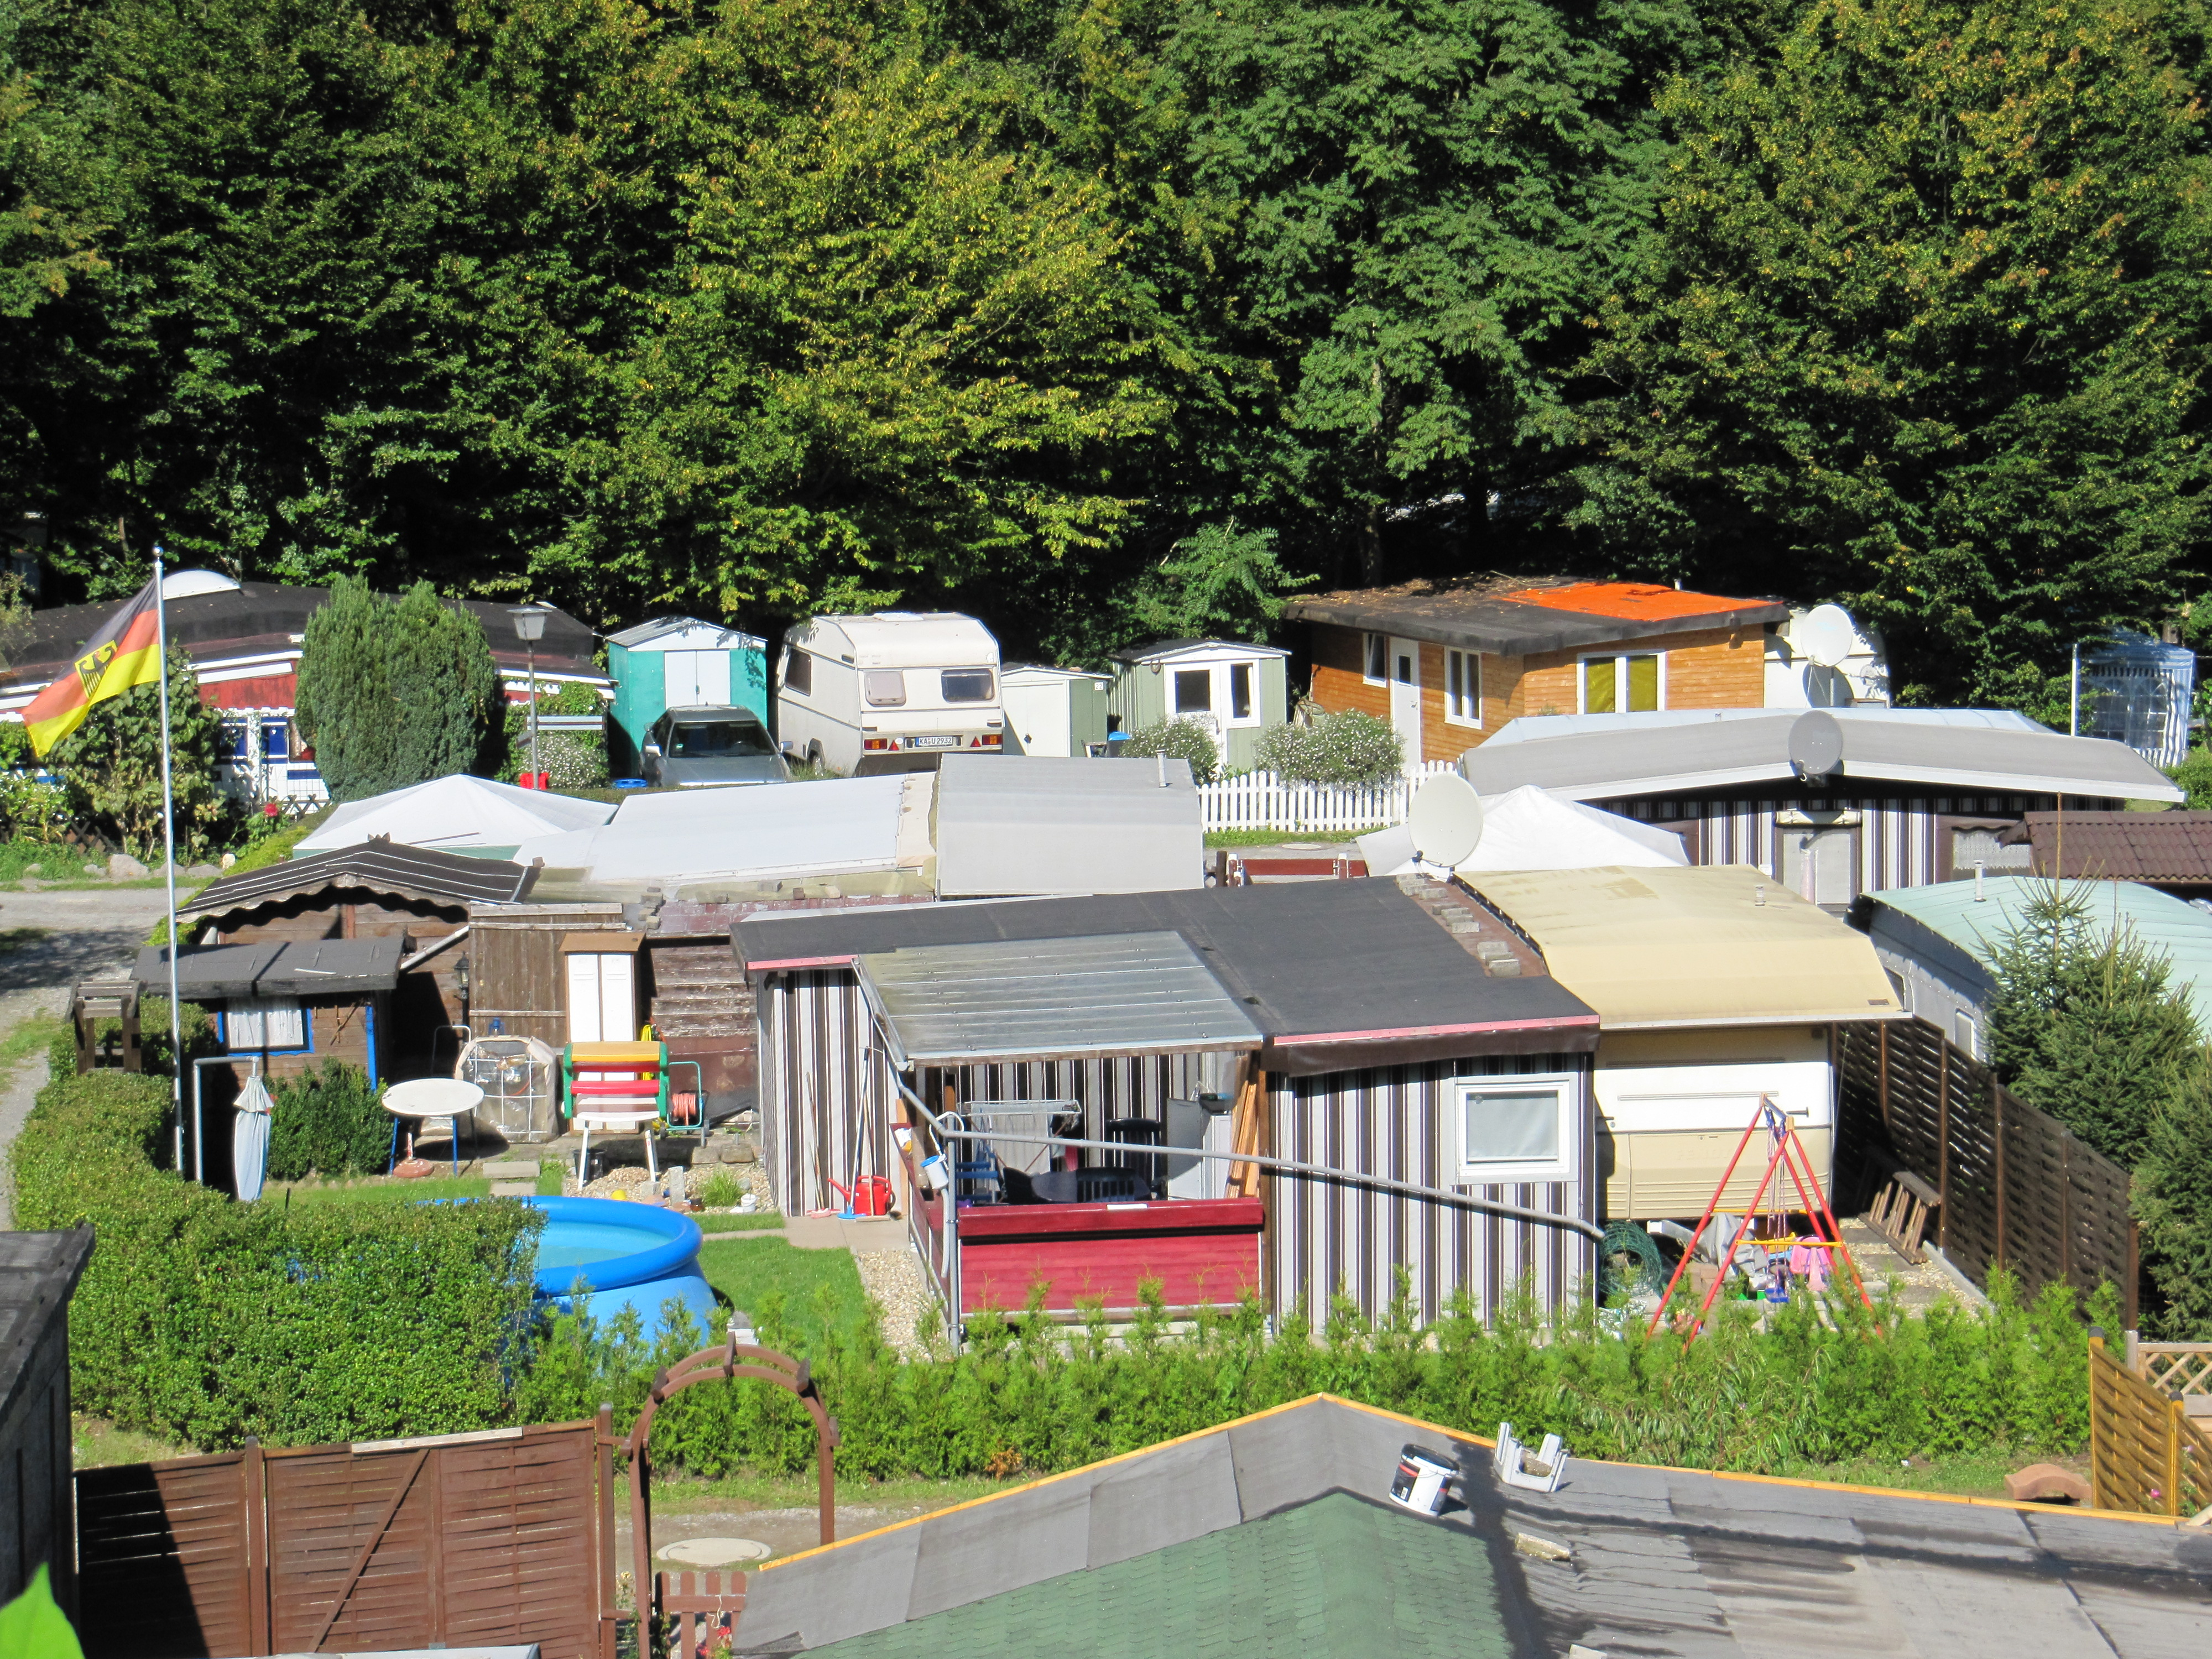 Campingplatz Bruchsal